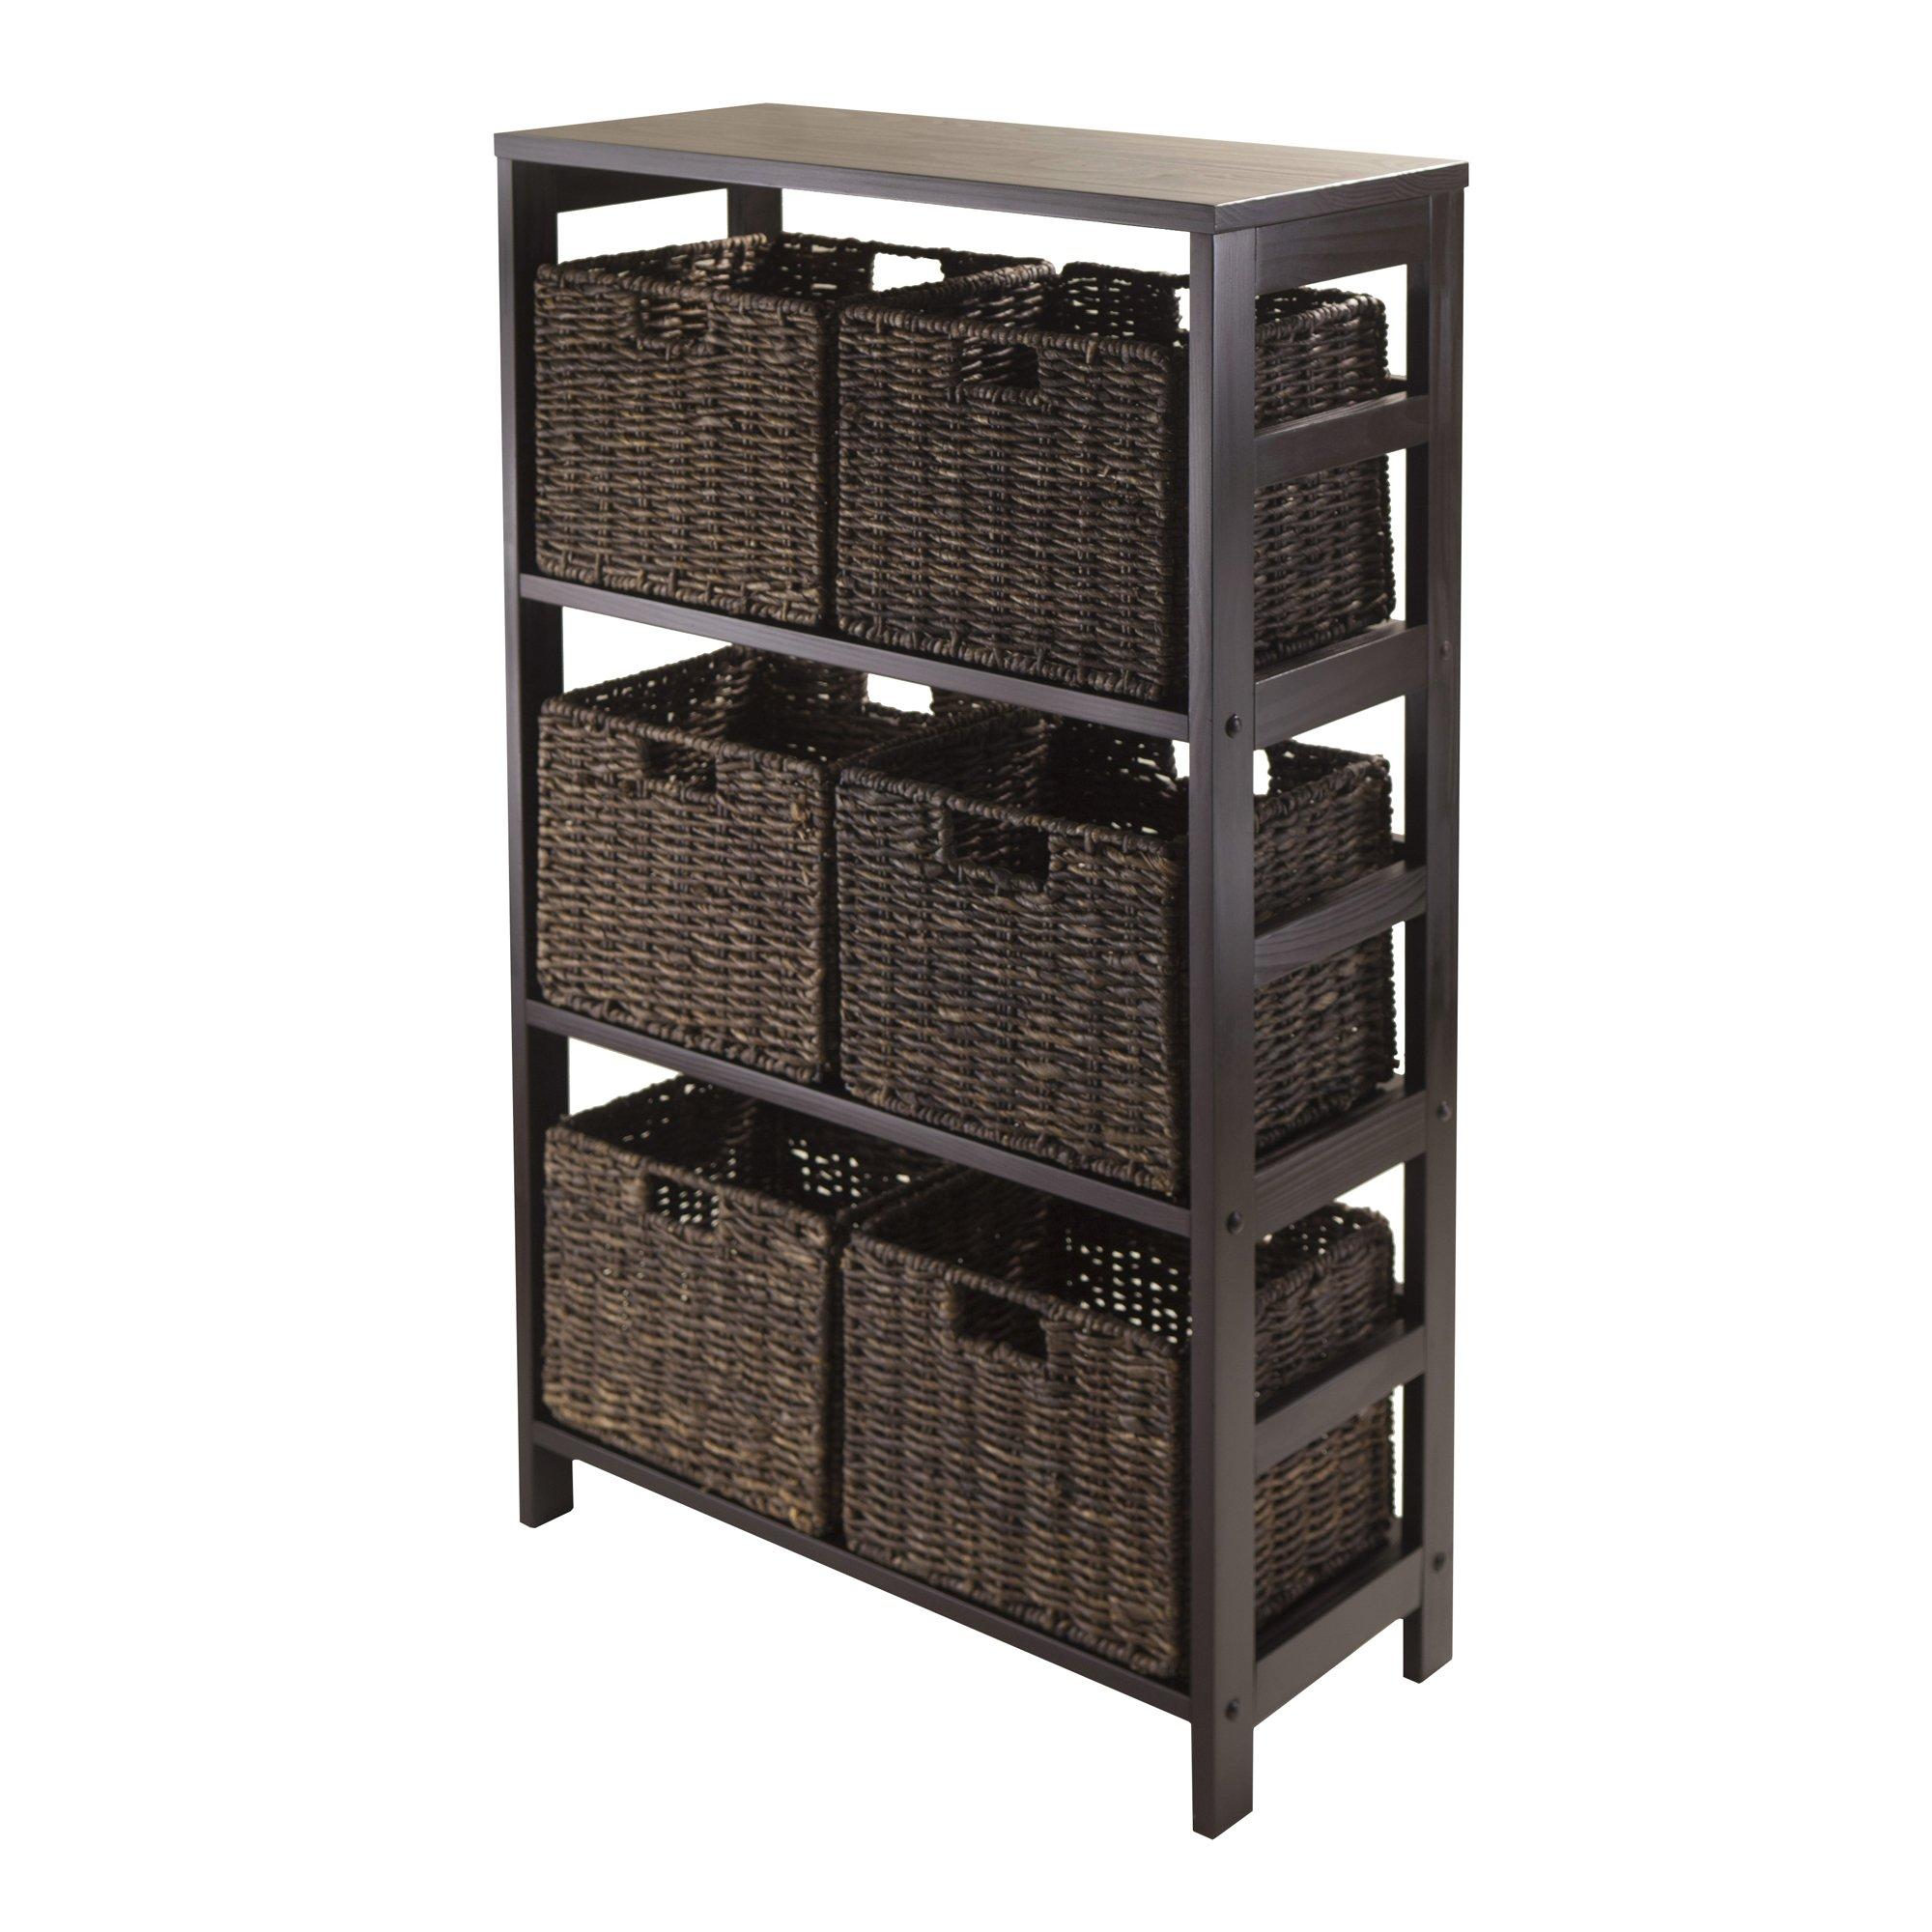 Winsome Granville 7-Piece Storage Shelf with 6-Foldable Baskets, Espresso